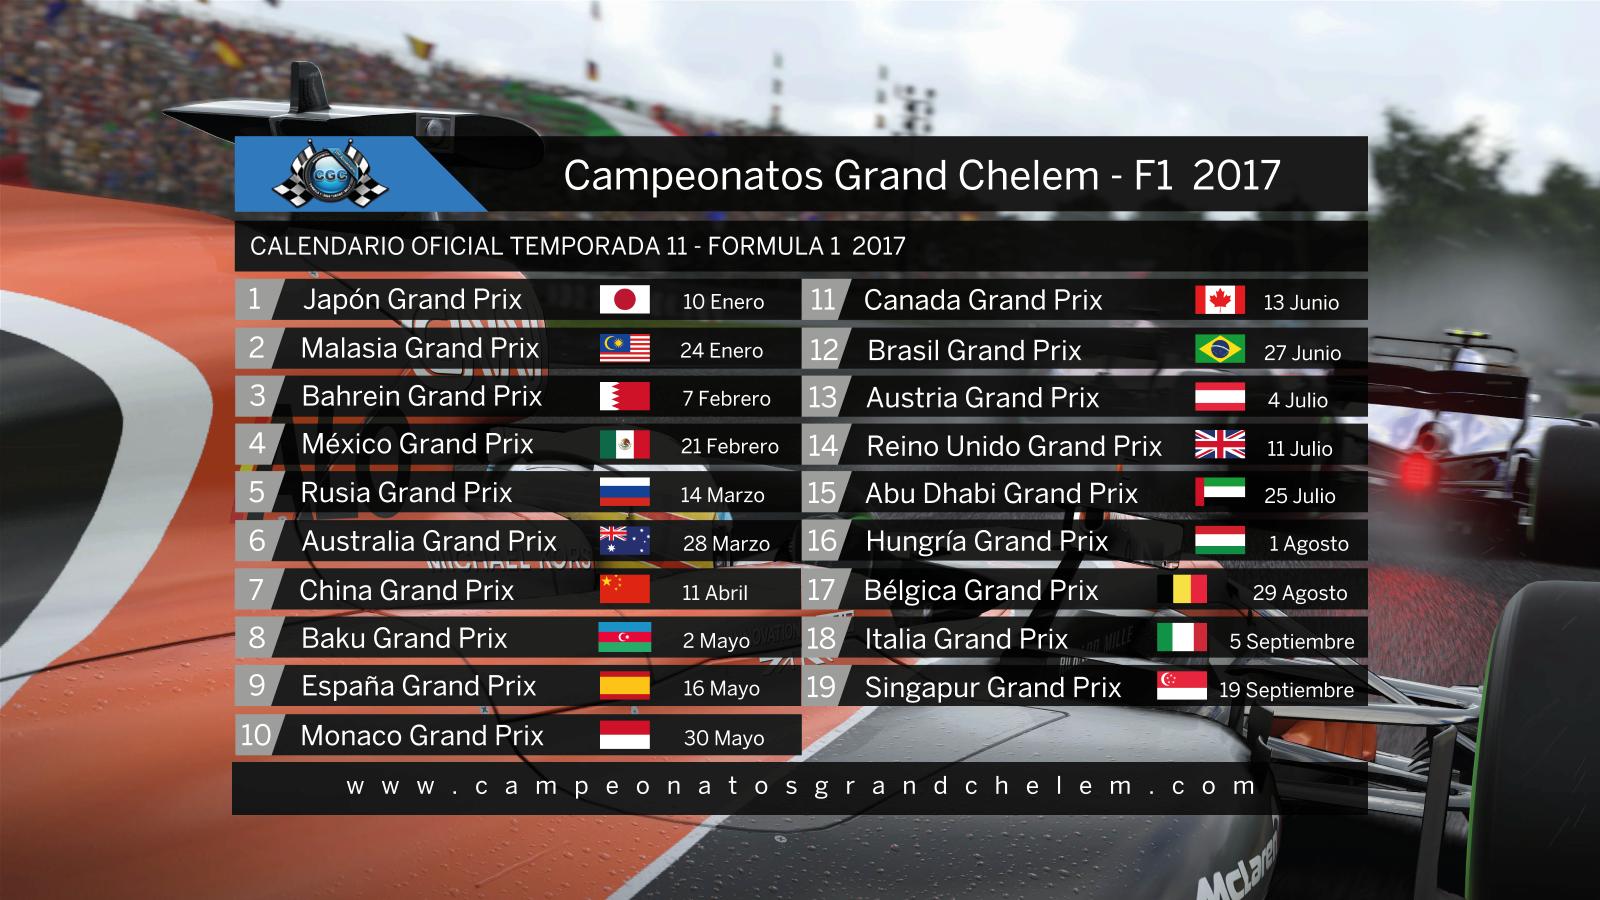 ▄▀▄▀▄▀ Inscripciones T11 | Campeonatos Grand Chelem | F1 2017 ▀▄▀▄▀▄   13ymjae